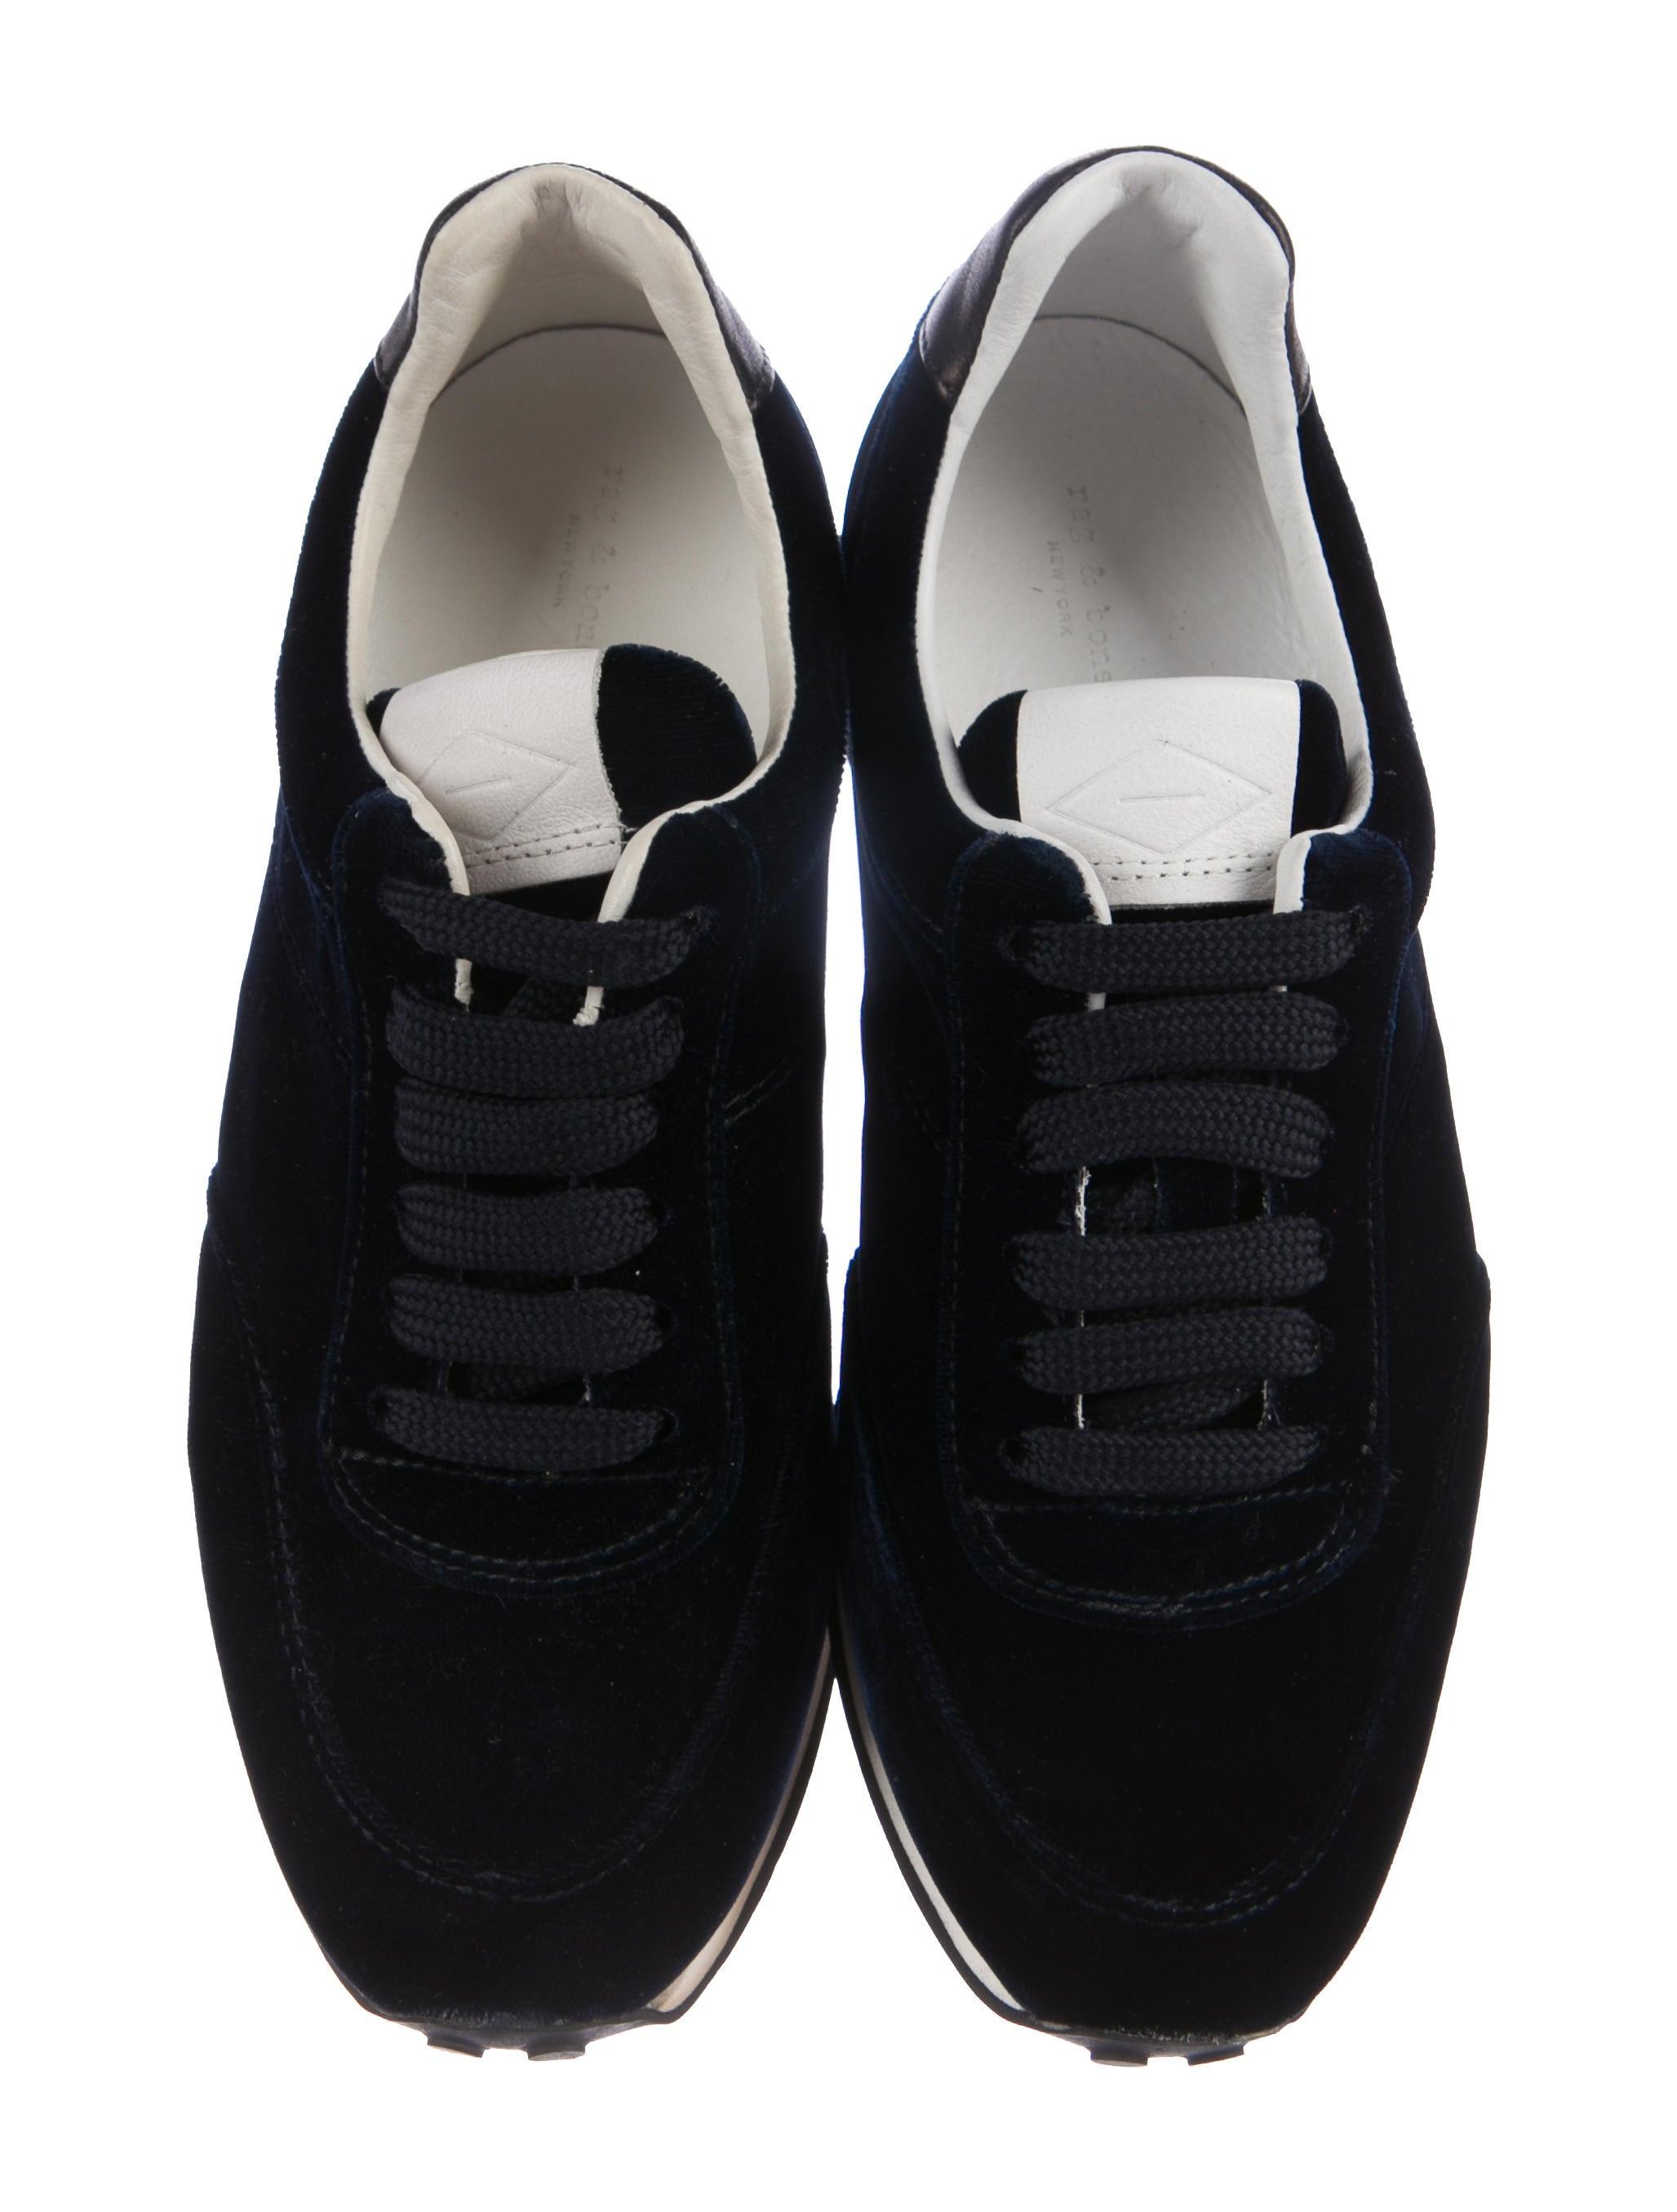 sale cheap online Rag & Bone Dylan Runner Velvet Sneakers w/ Tags websites for sale pkqtNW4